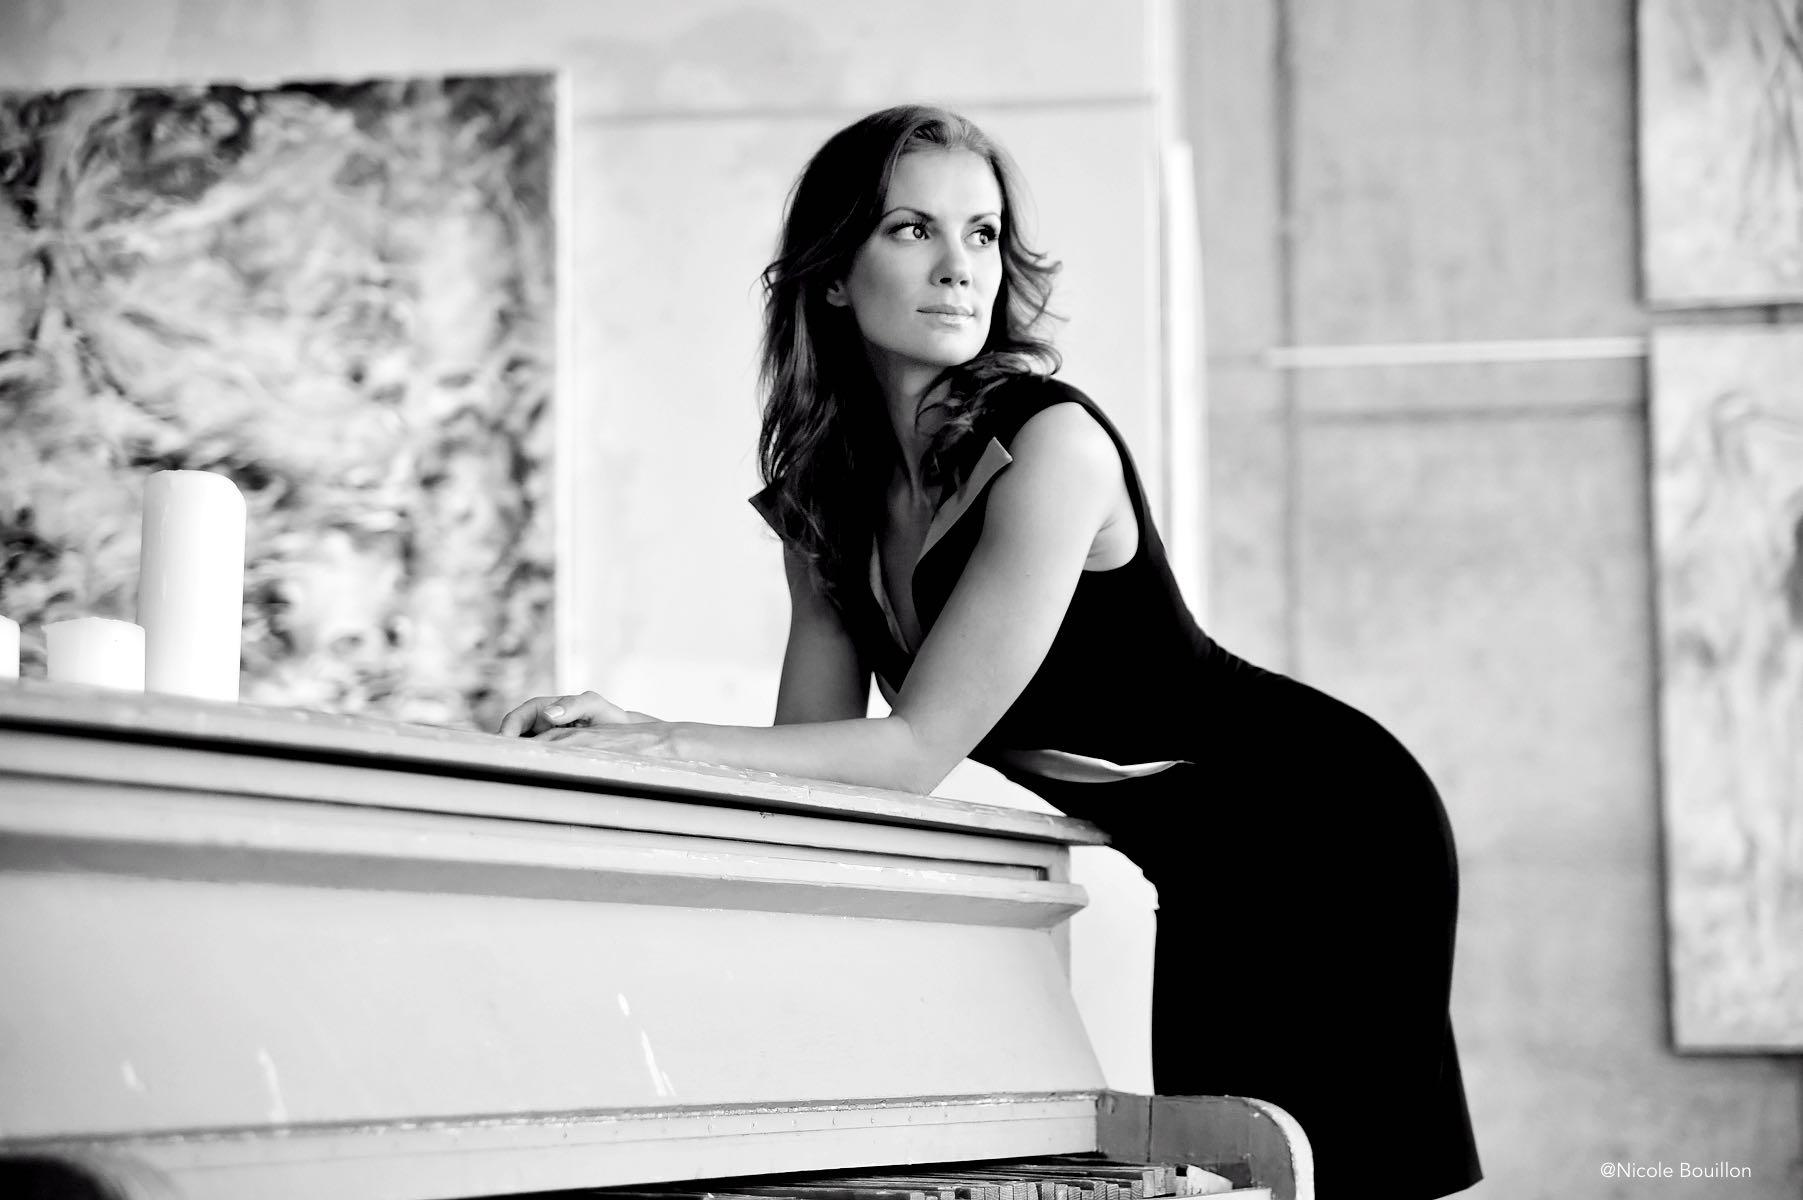 Moderatorin und Yoga Expertin Kerstin Linnartz über Beautyrituale im Beautyinterview der Schminktante.